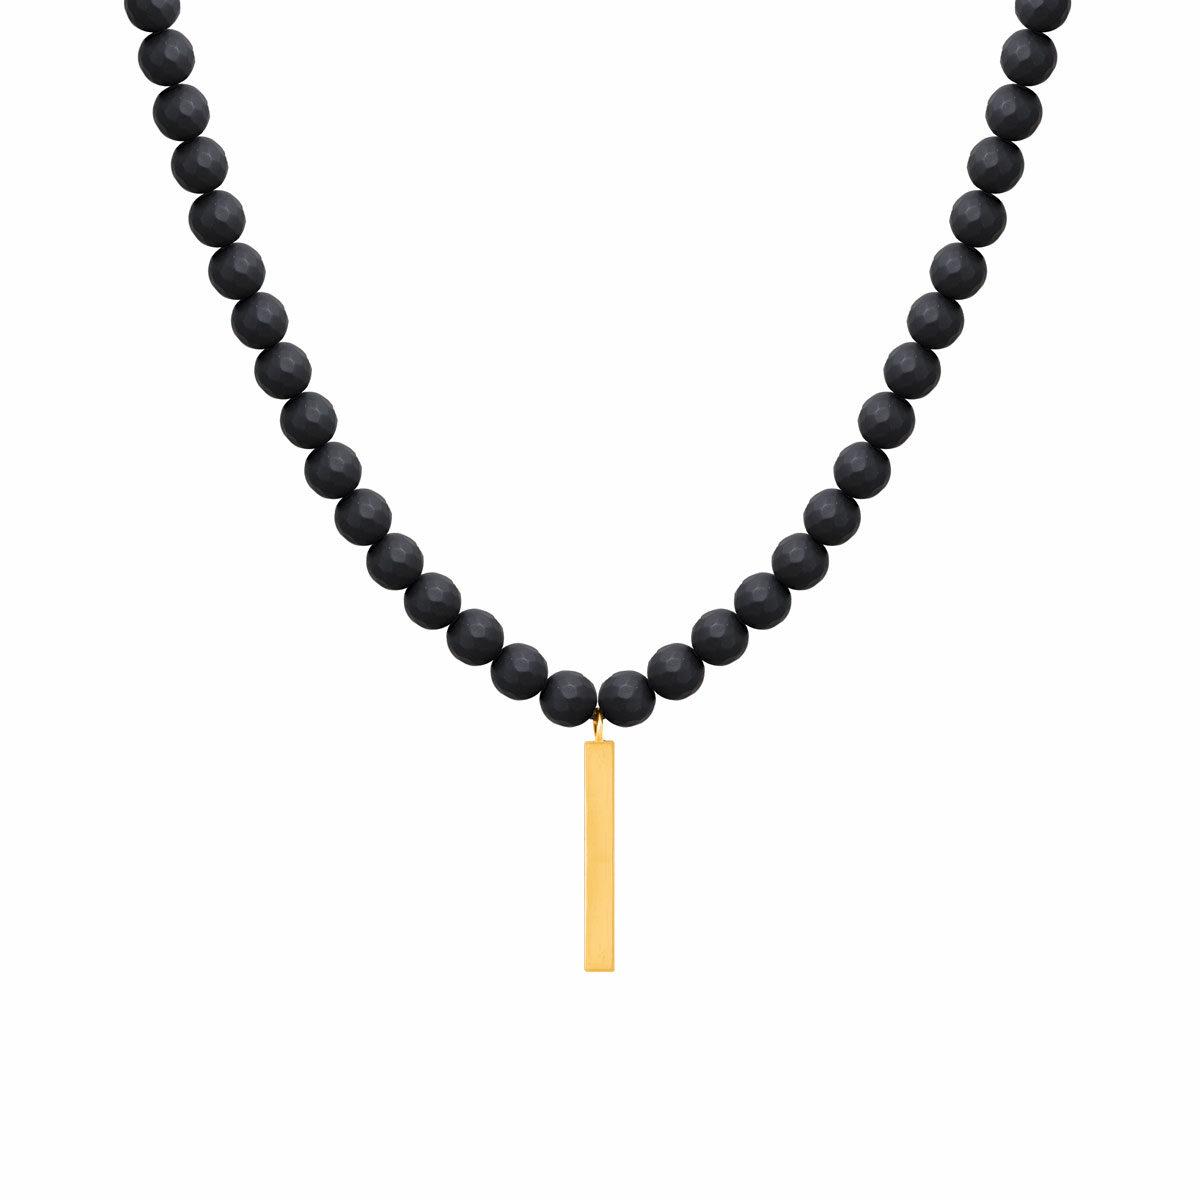 گردنبند طلا پلیت | parasteh